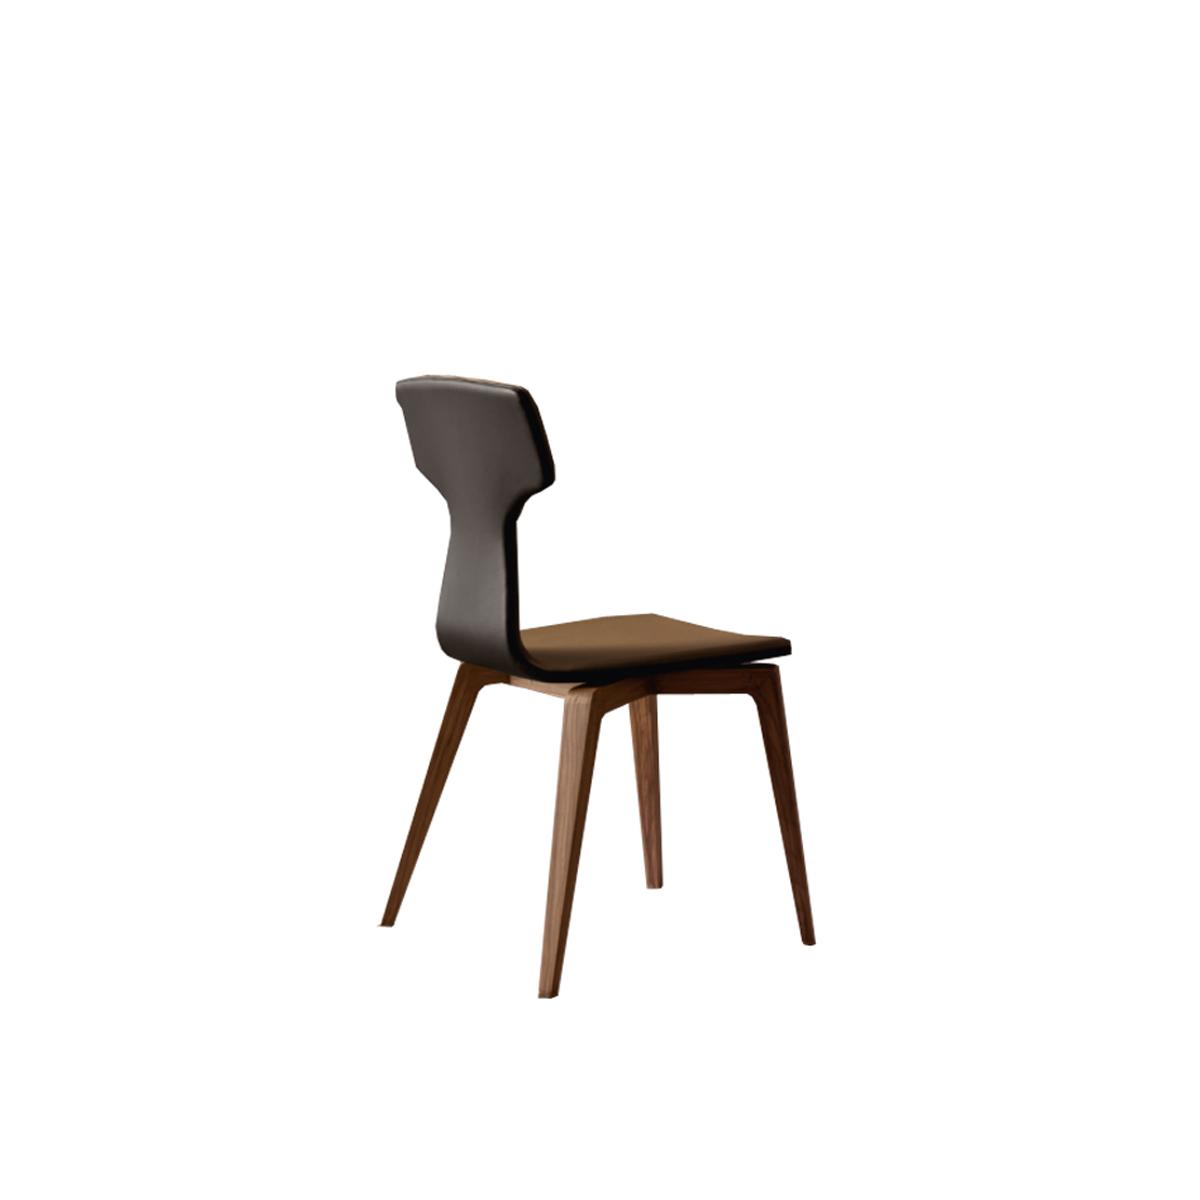 MONIKA CHAIR WALNUT Beyond Furniture